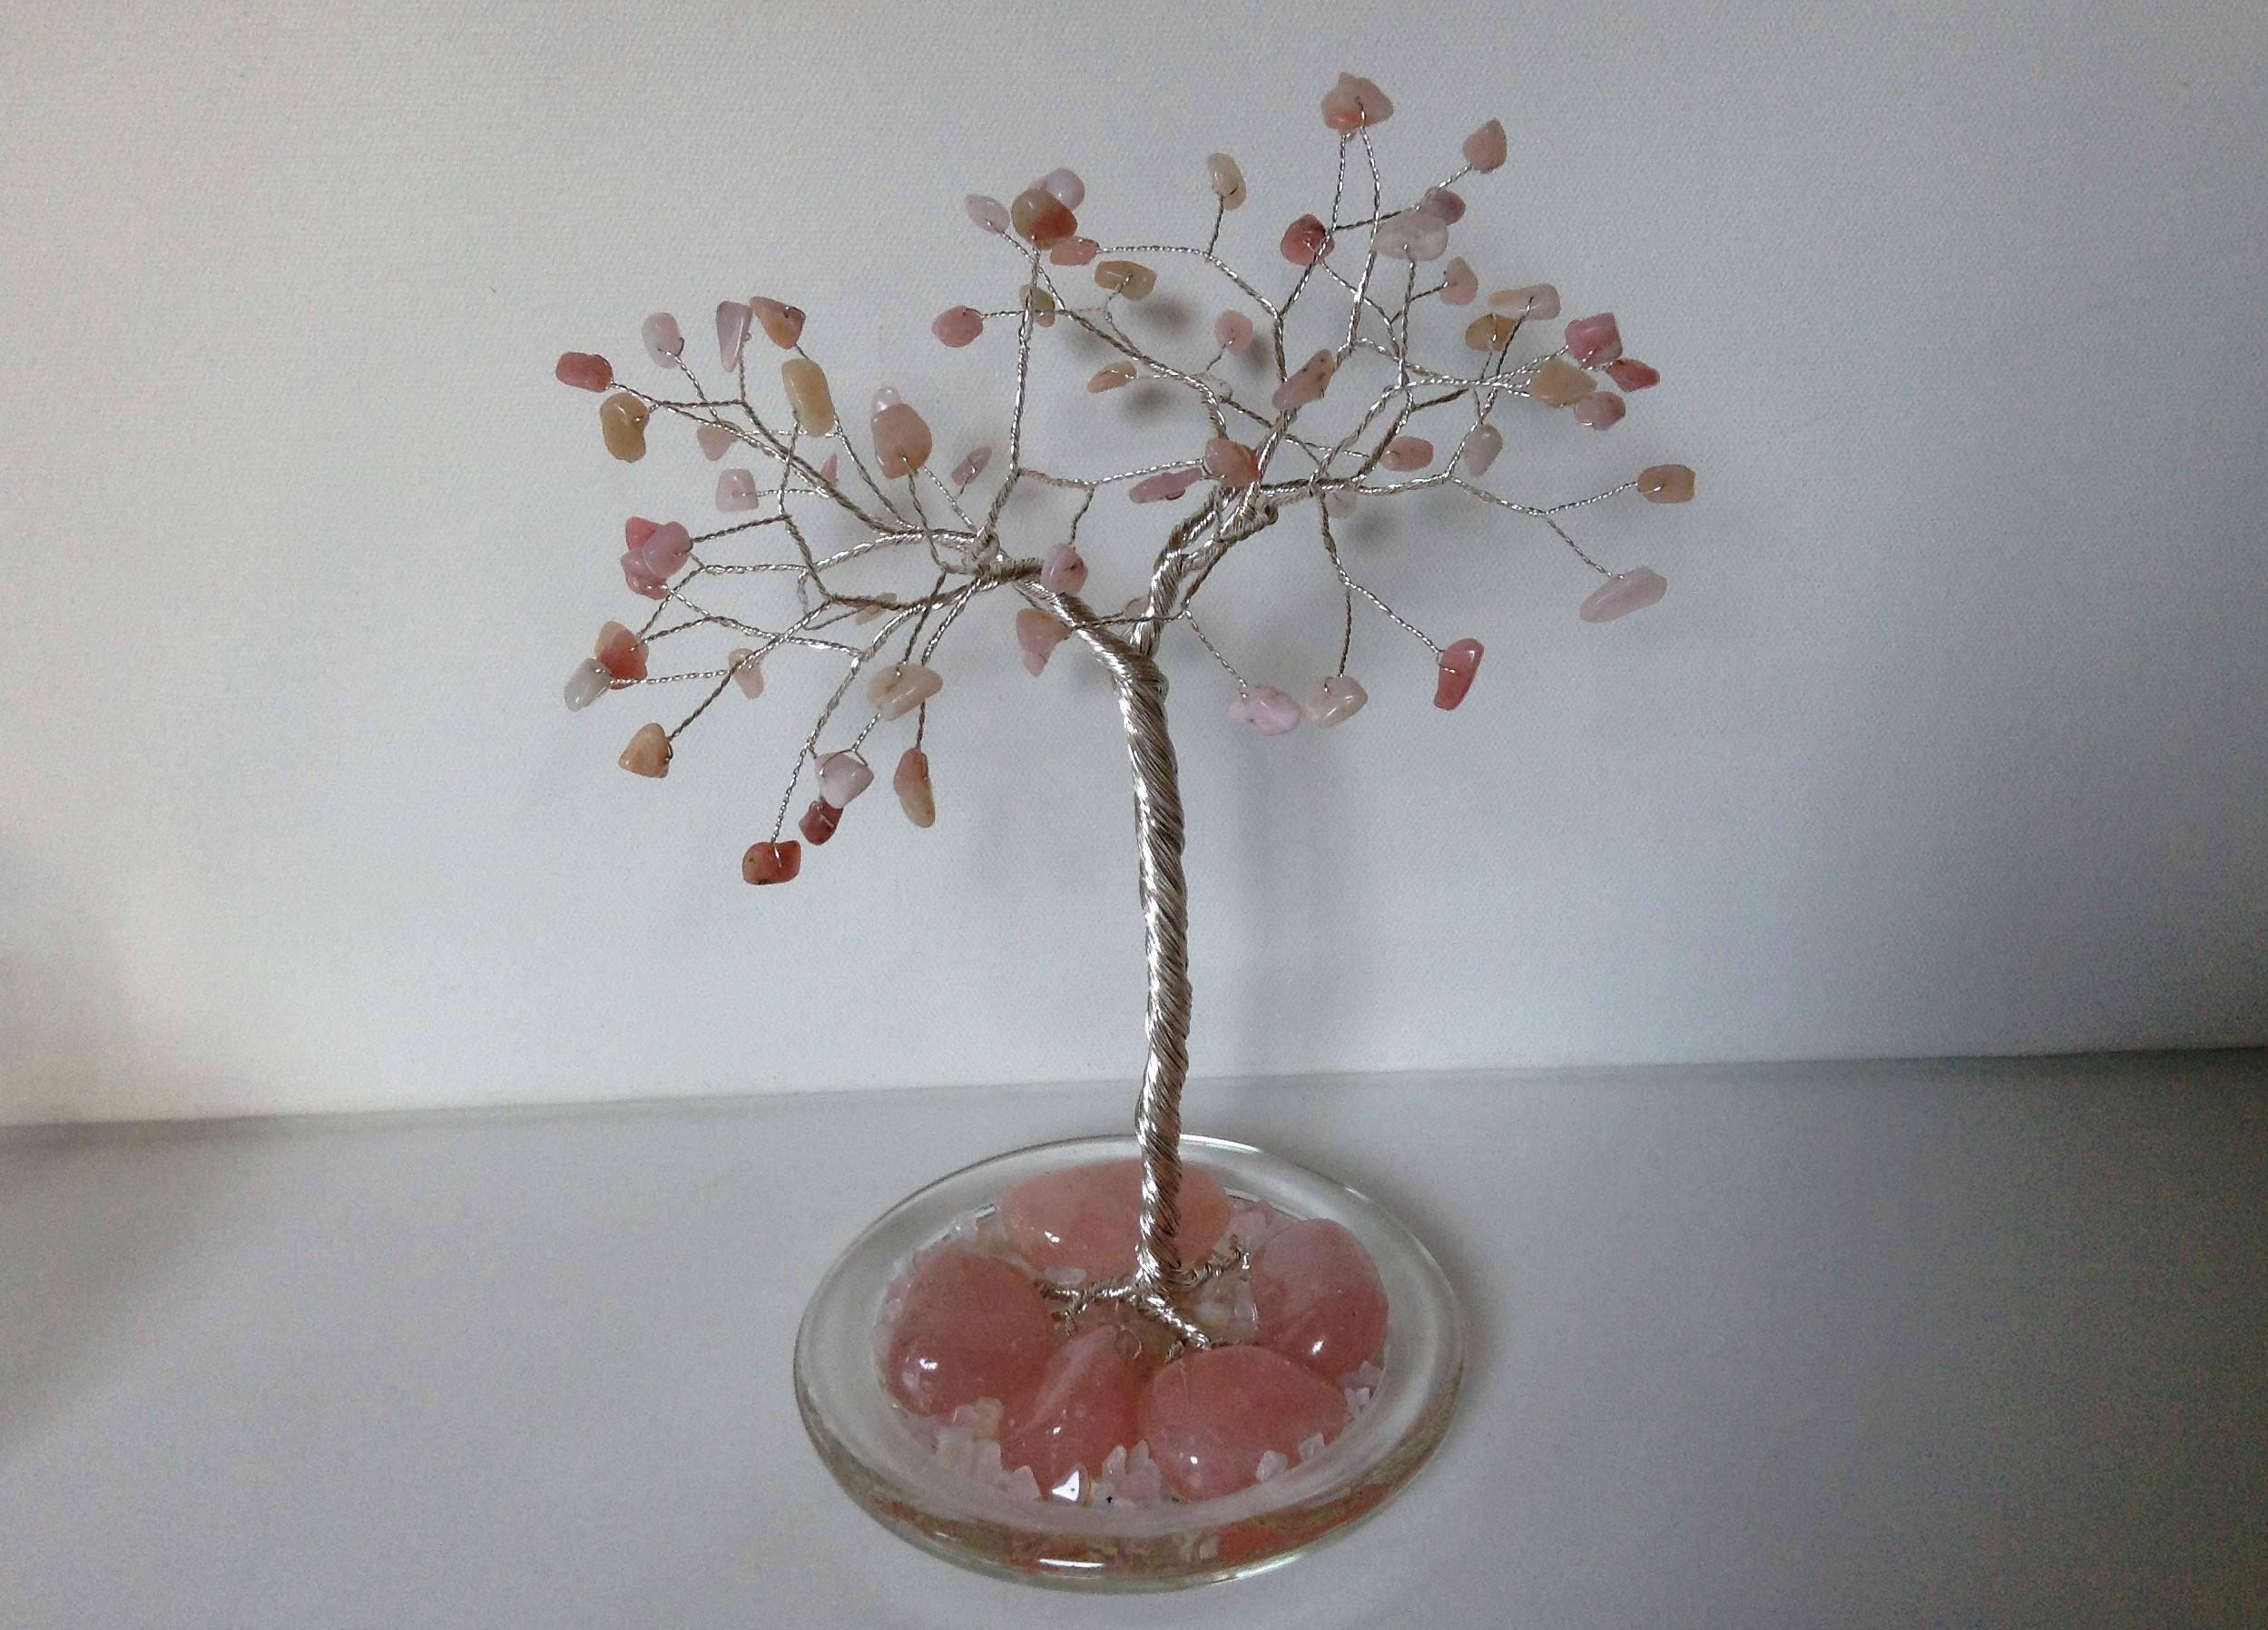 Gemütlich Draht Baum Ornament Fotos - Schaltplan Serie Circuit ...